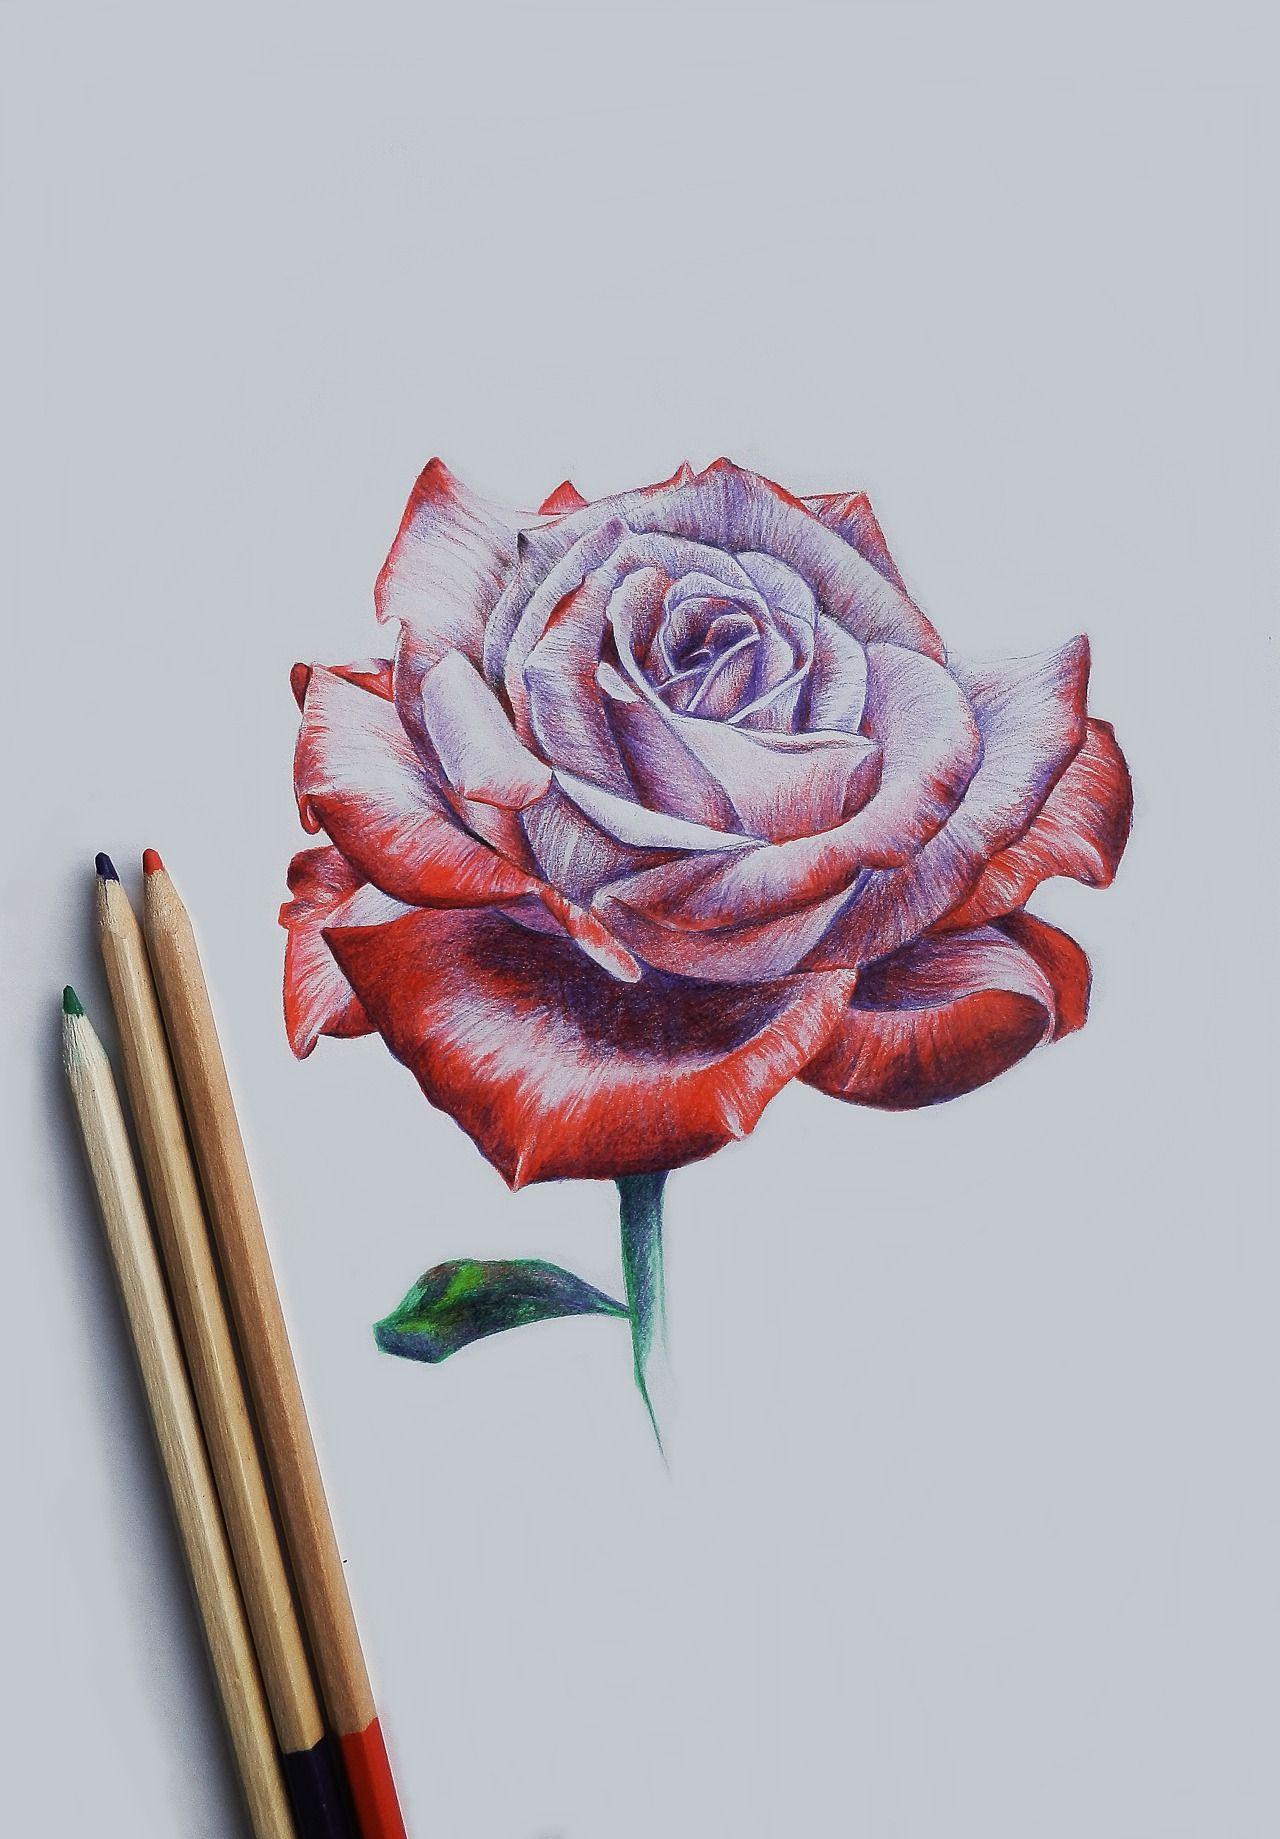 Pinterest Zeichnungen Bleistift Genial Pinterest Nuggwifee☽ ☼☾ Drawing Pinterest Sammlung